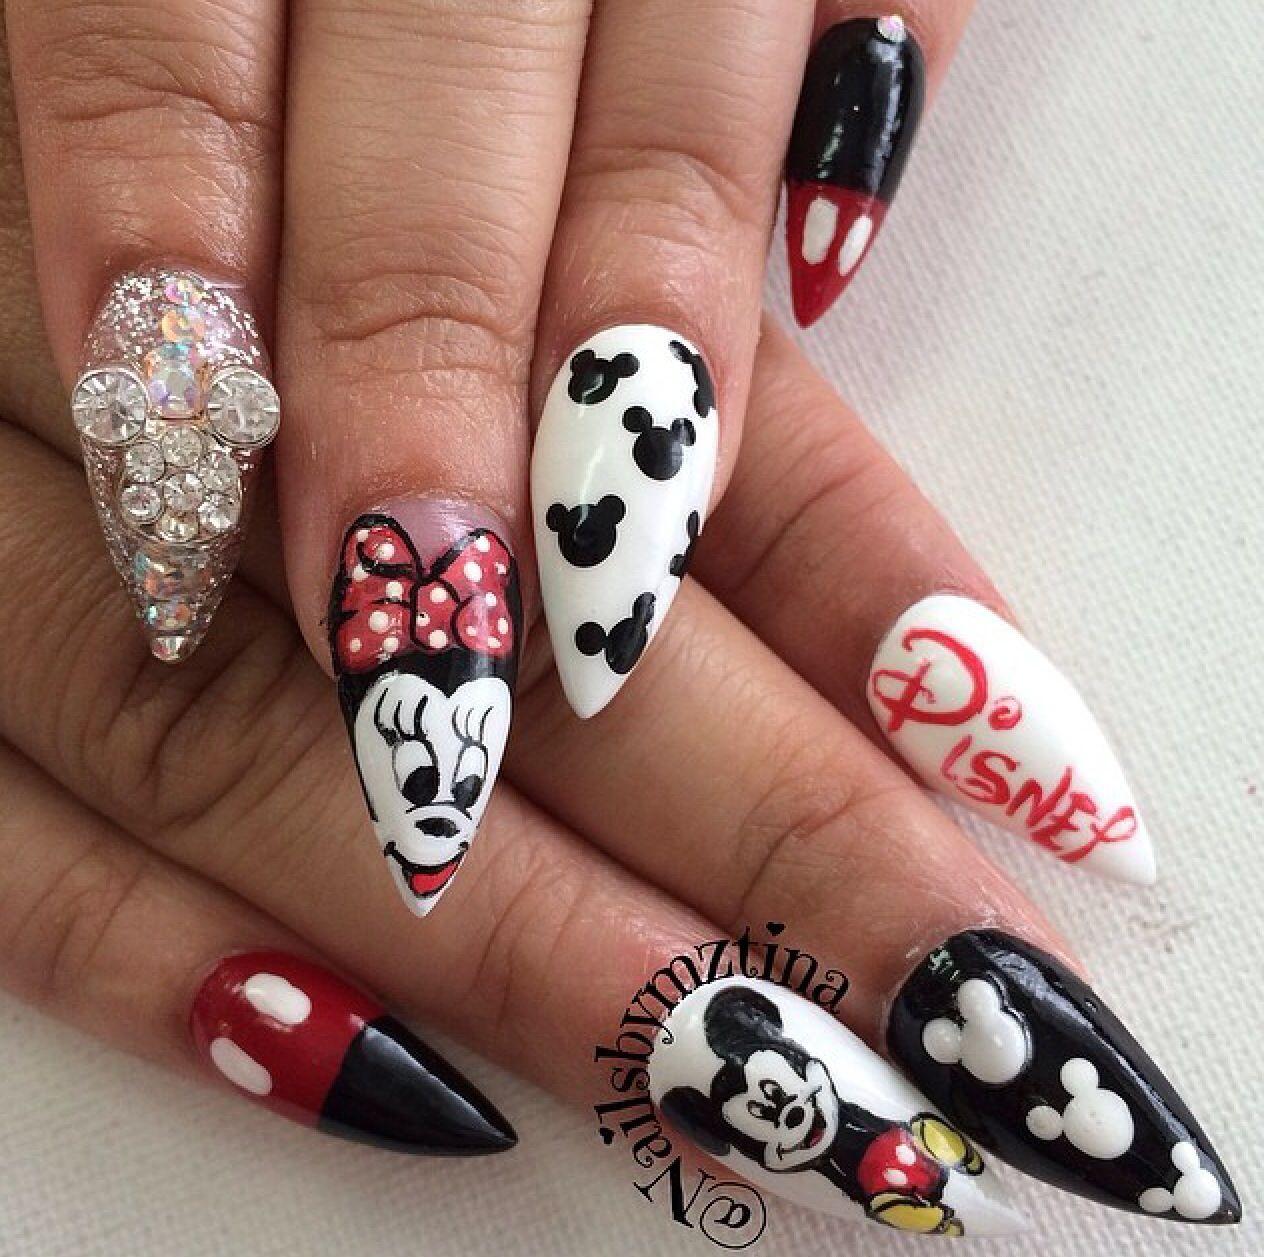 Mickey & Minnie Nails | Mickey nails, Minnie mouse nails ...